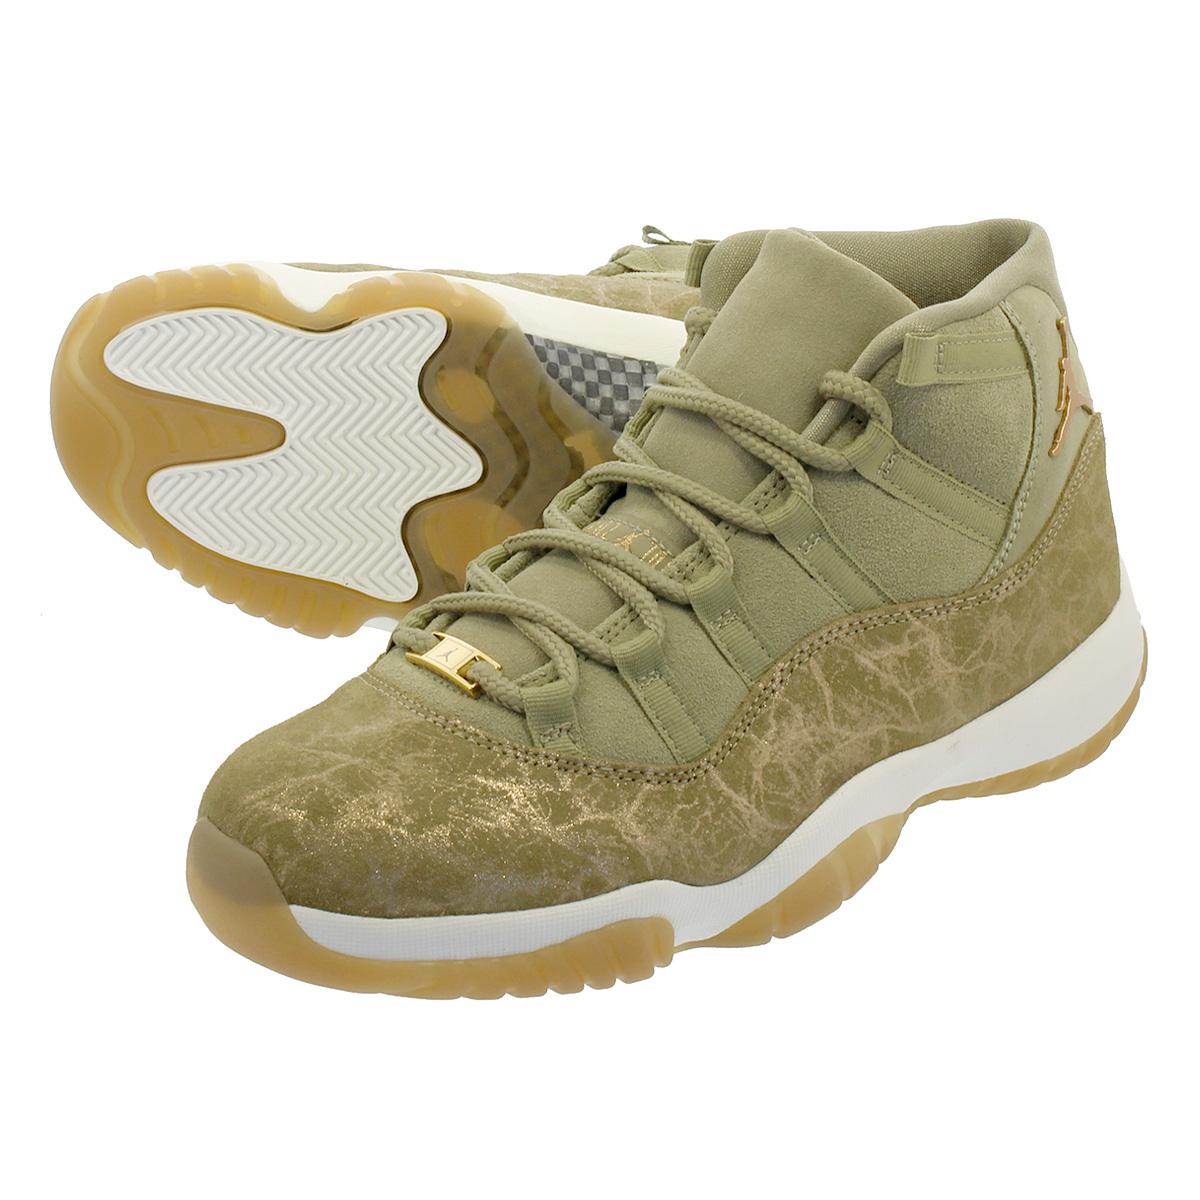 newest collection 25ad8 659c6 NIKE WMNS AIR JORDAN 11 RETRO Nike women Air Jordan 11 nostalgic NEUTRAL  OLIVE MTLC STOUT SAIL ar0715-200